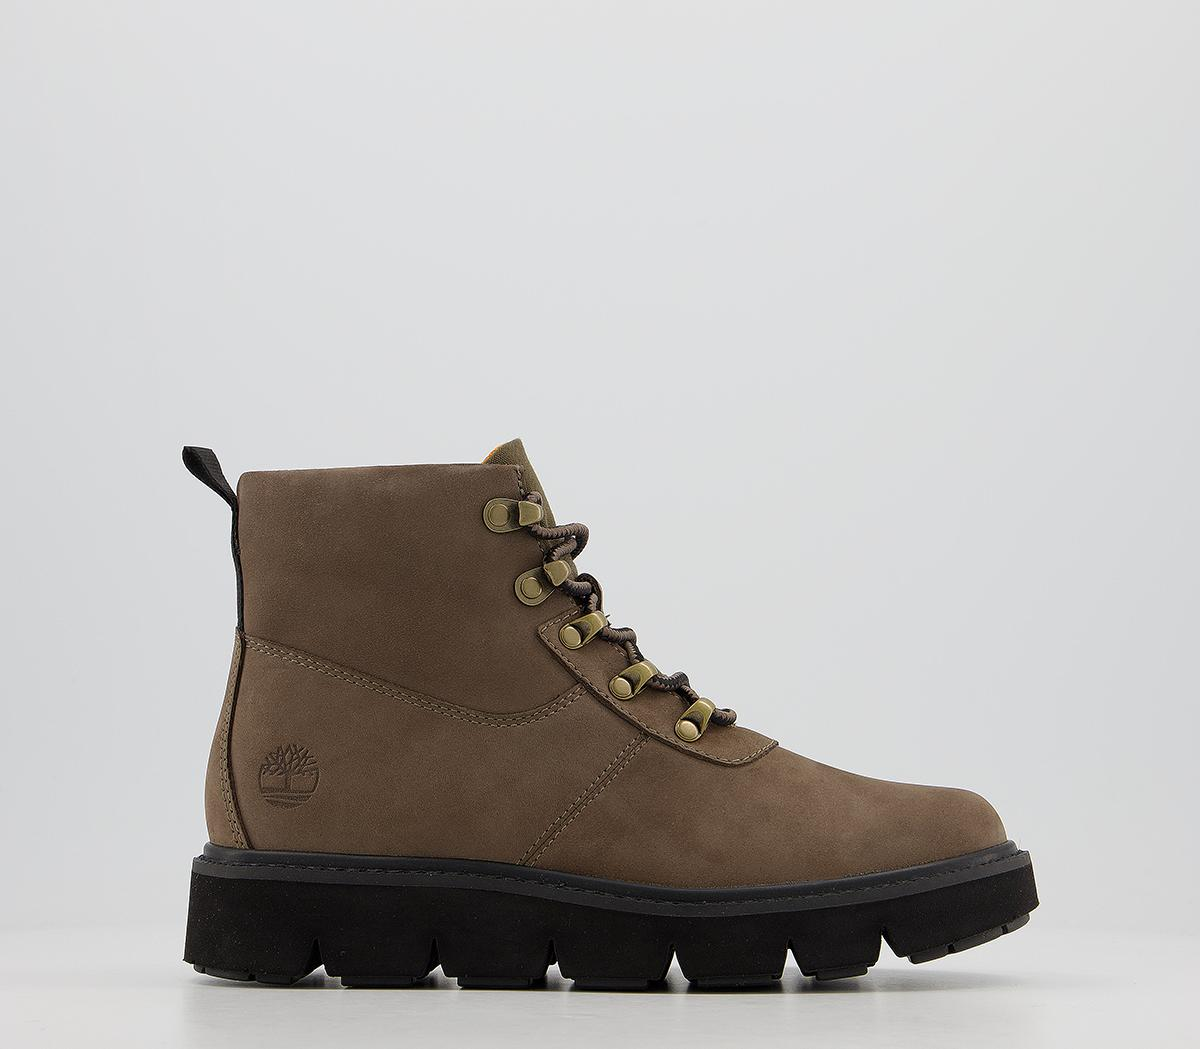 Raywood Alpine Hiker Boots